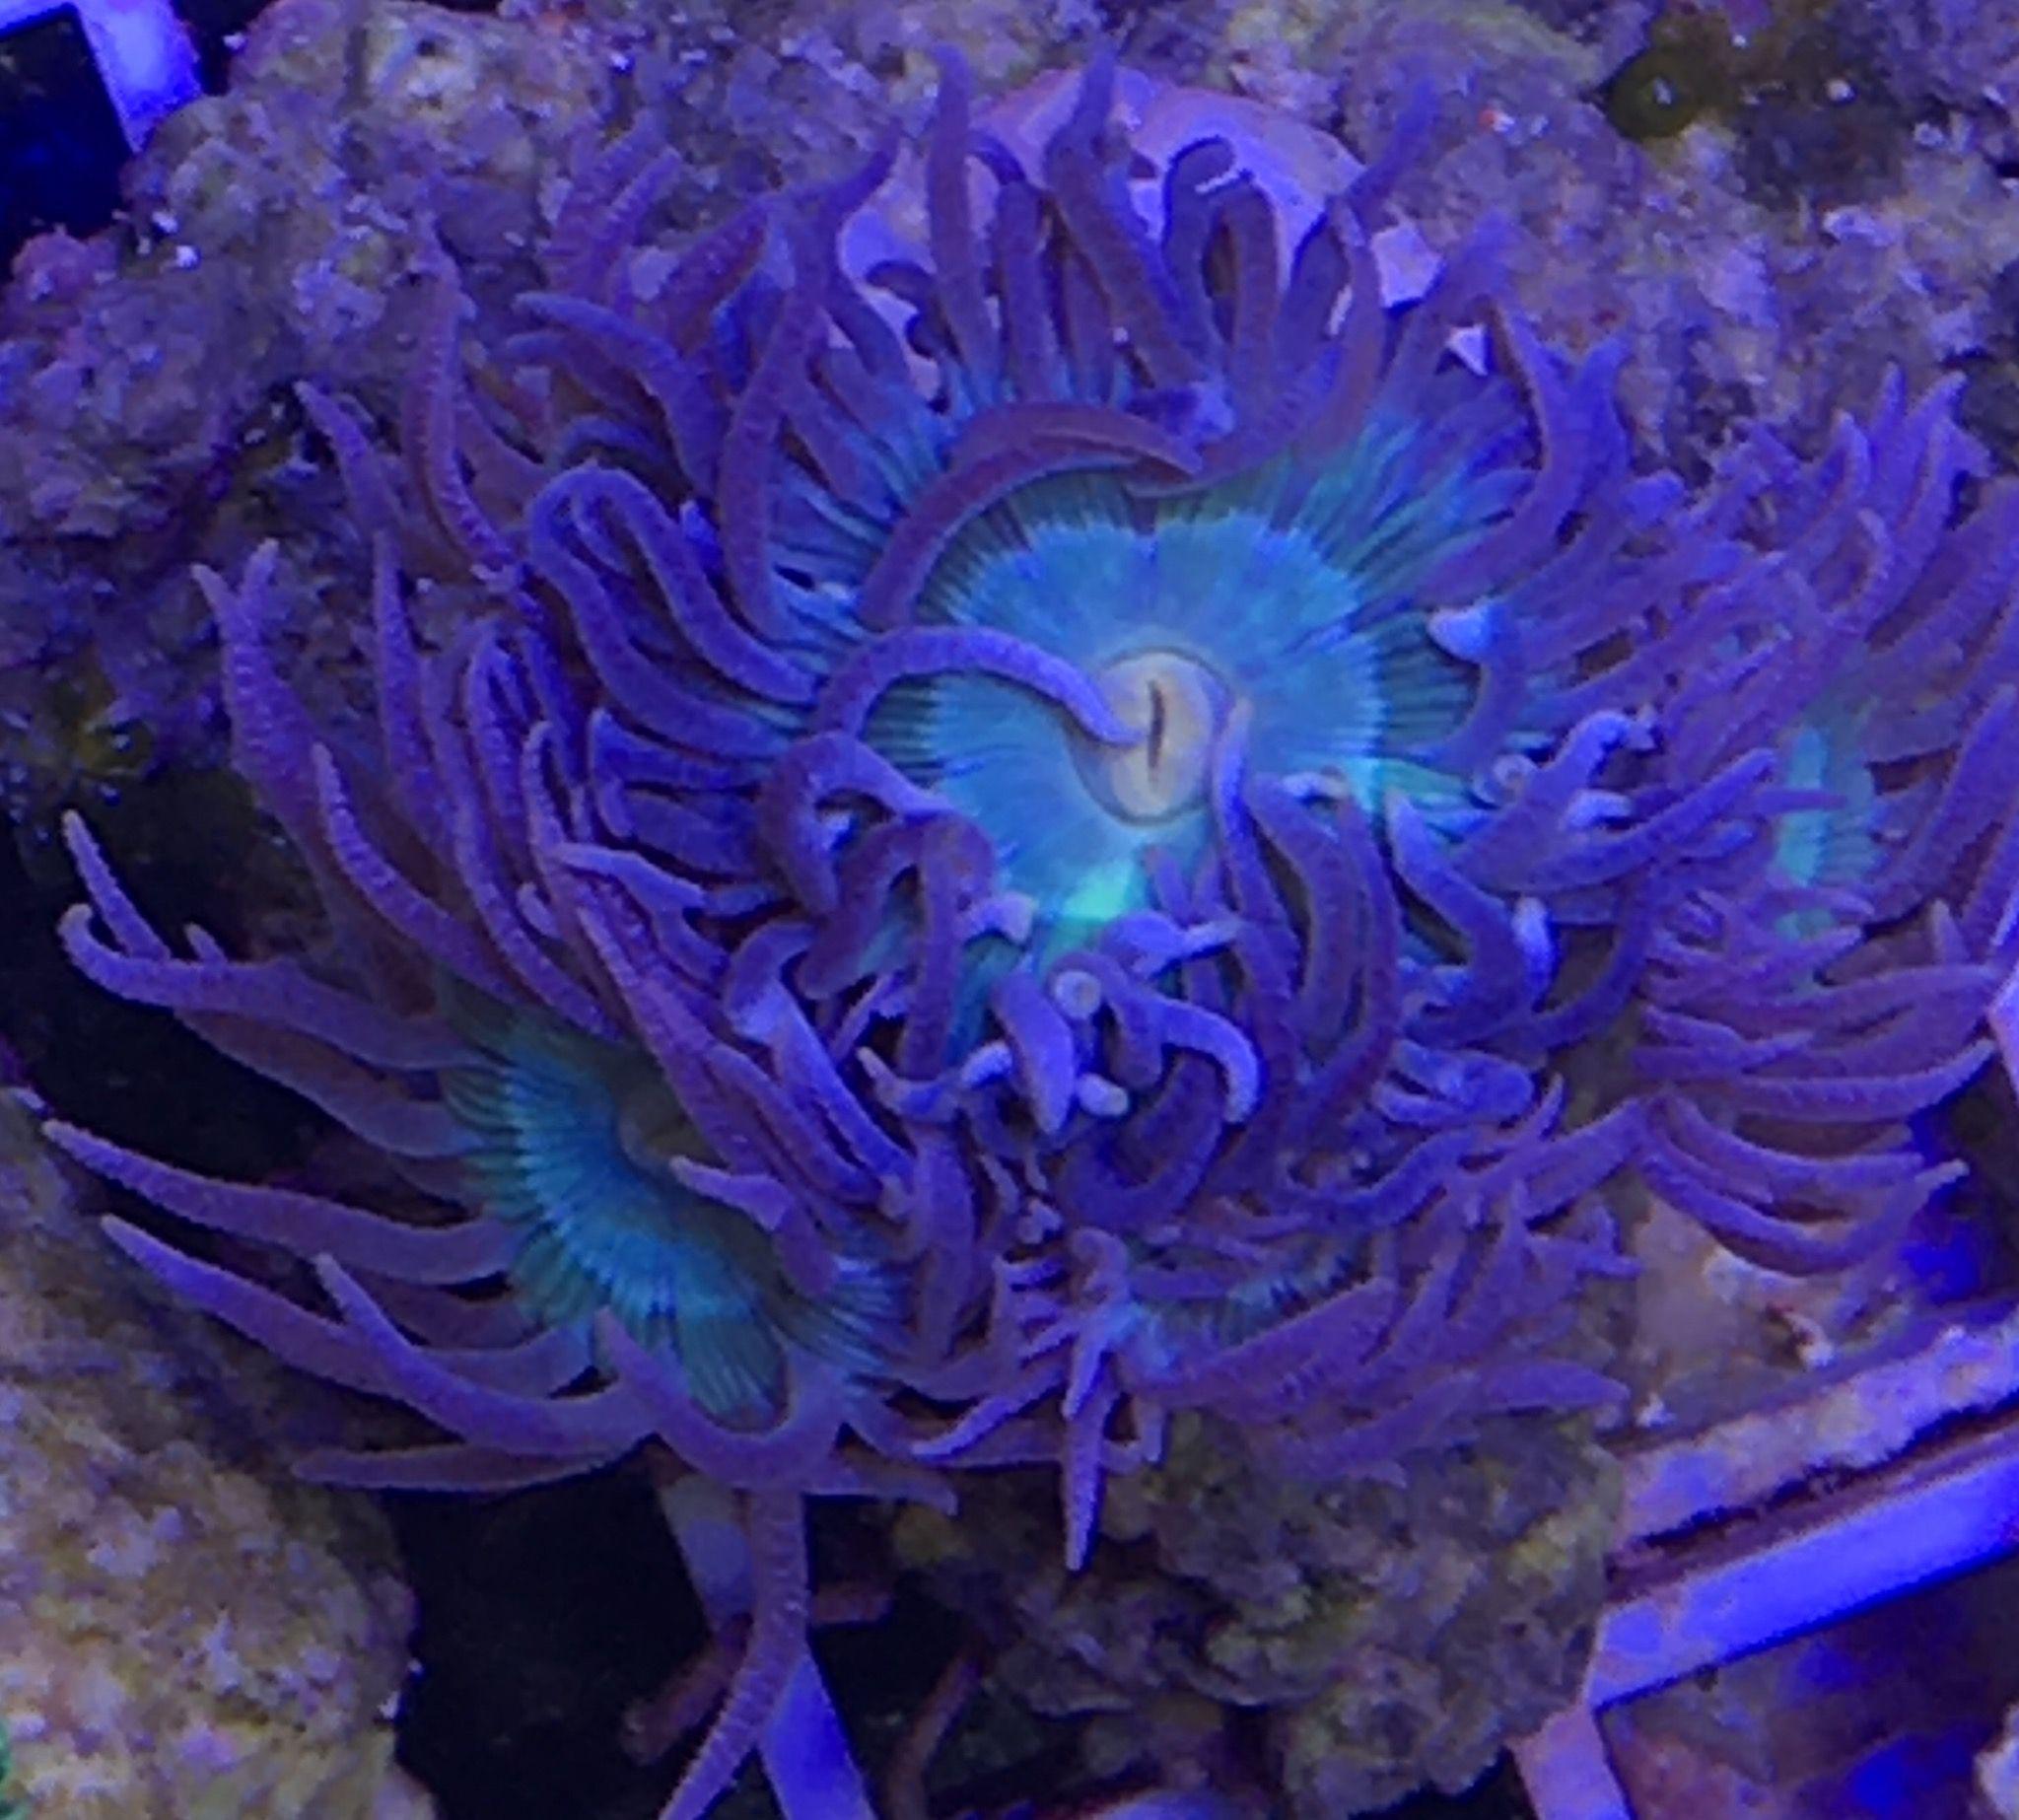 Duncanopsammia Axifuga 3 Polypen Steinkorallen Meerwasser Aquarium Doppelkopf